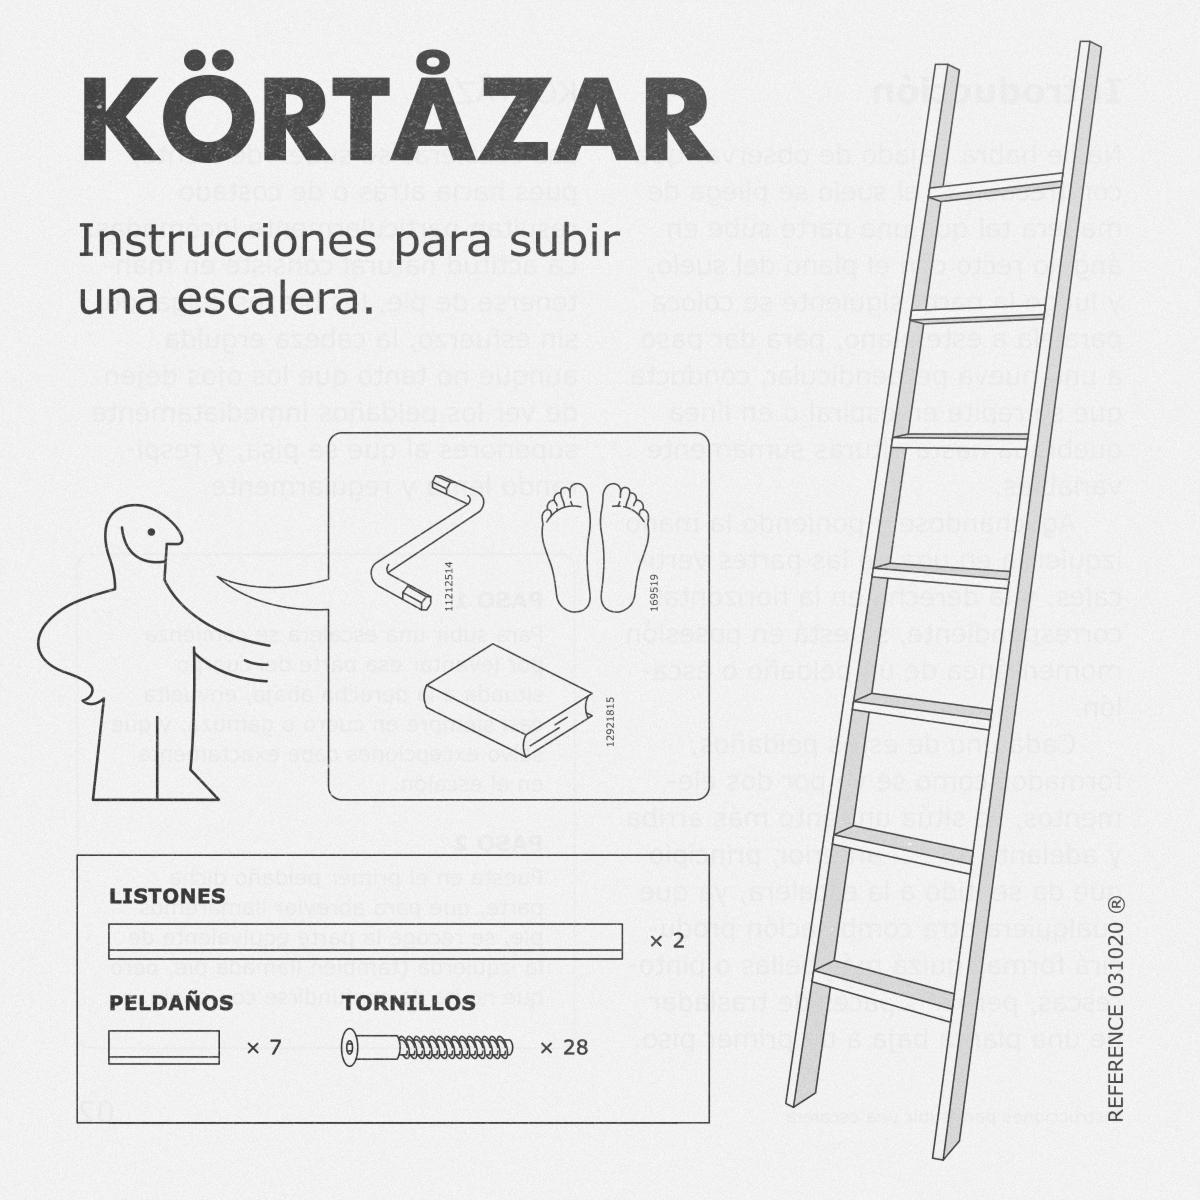 Kortazar_Post_MateoBuitrago-01